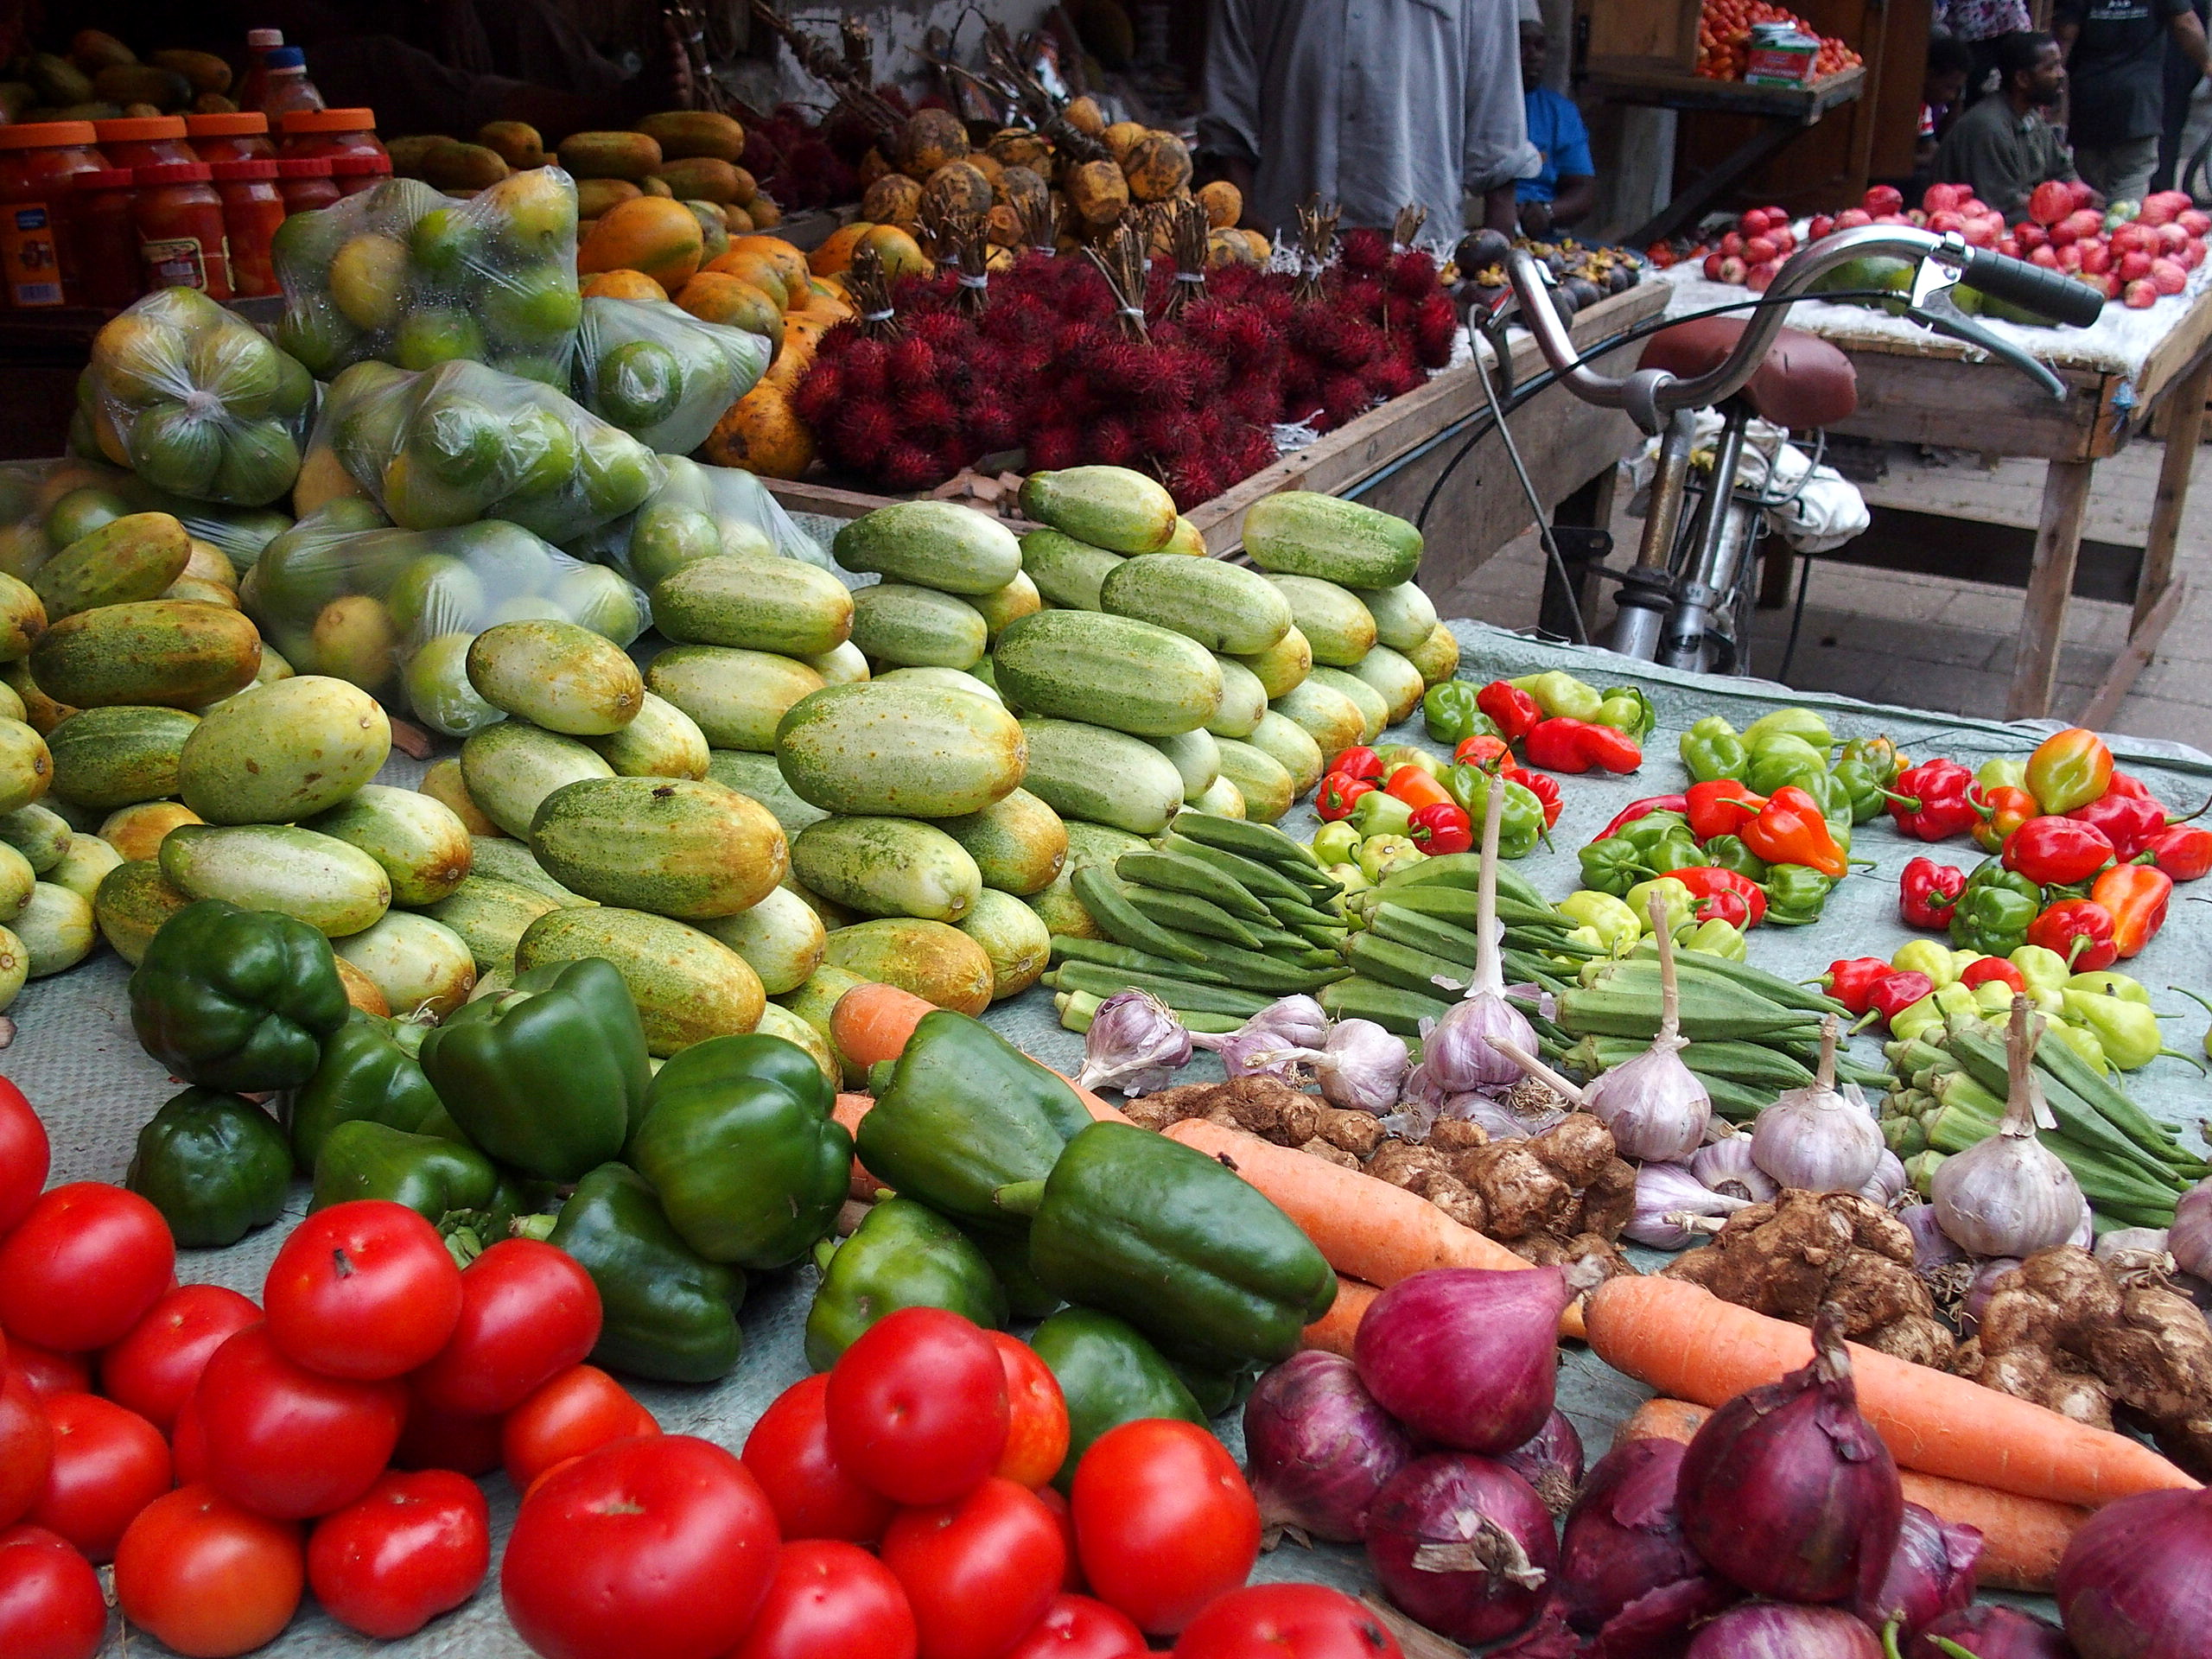 Bel étal de fruits et légumes marché Zanzibar